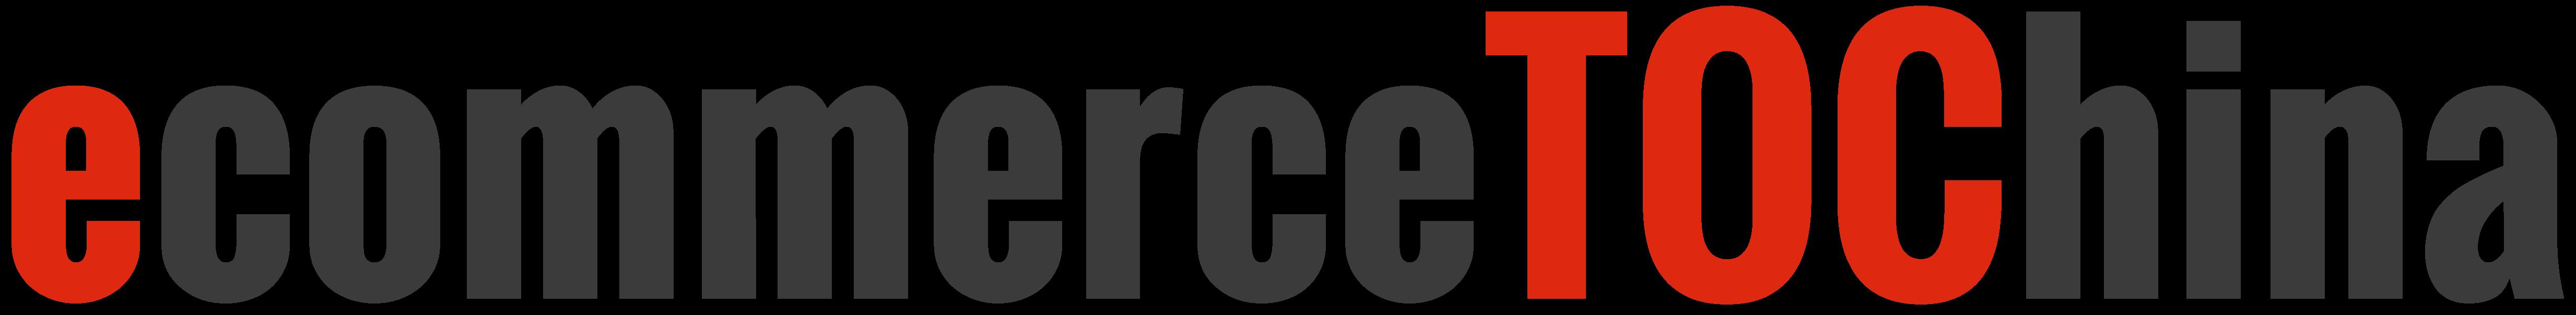 eCommerceTOChina